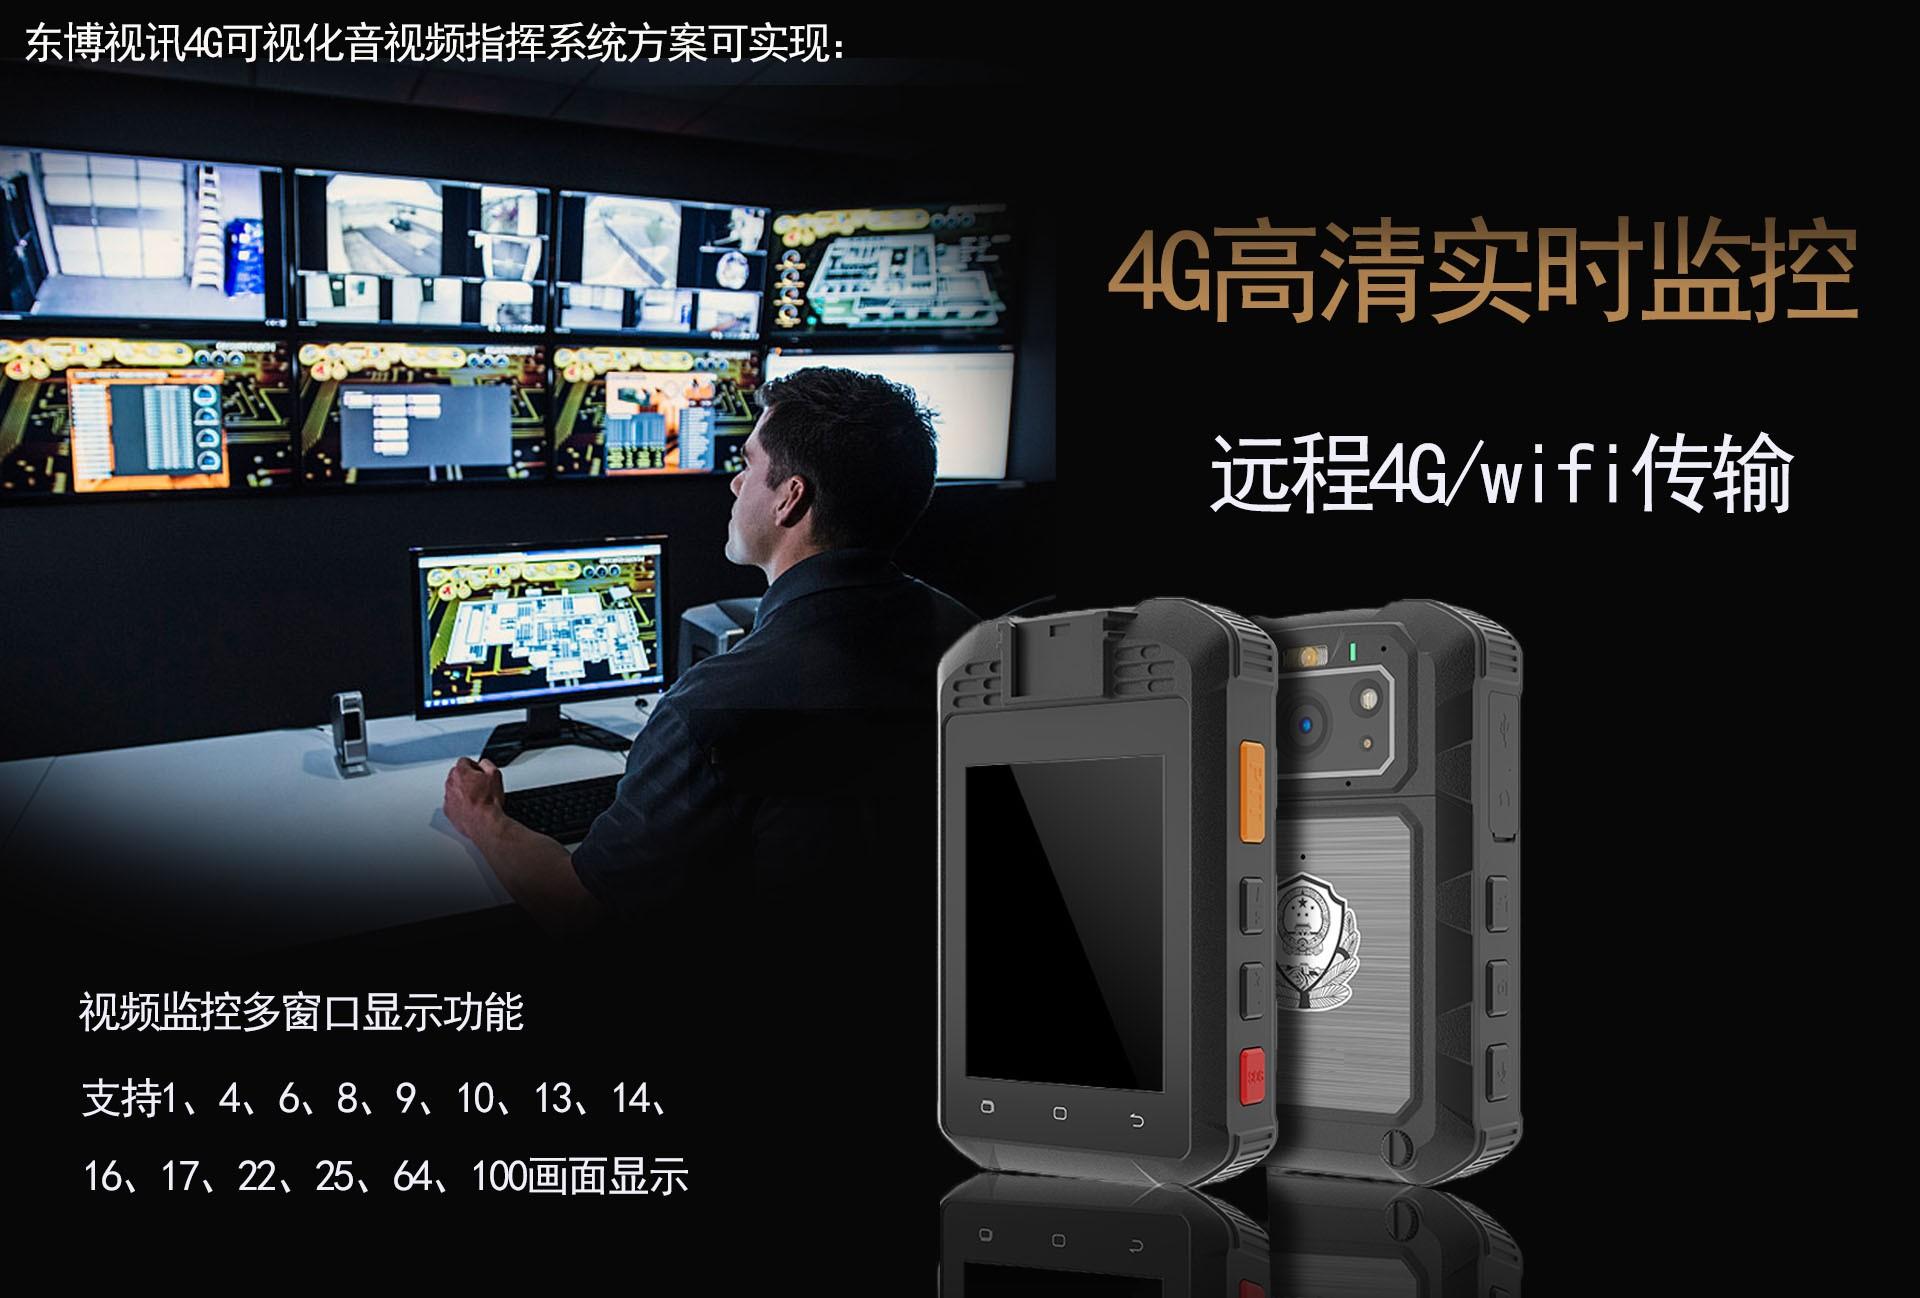 4G实时监控.jpg